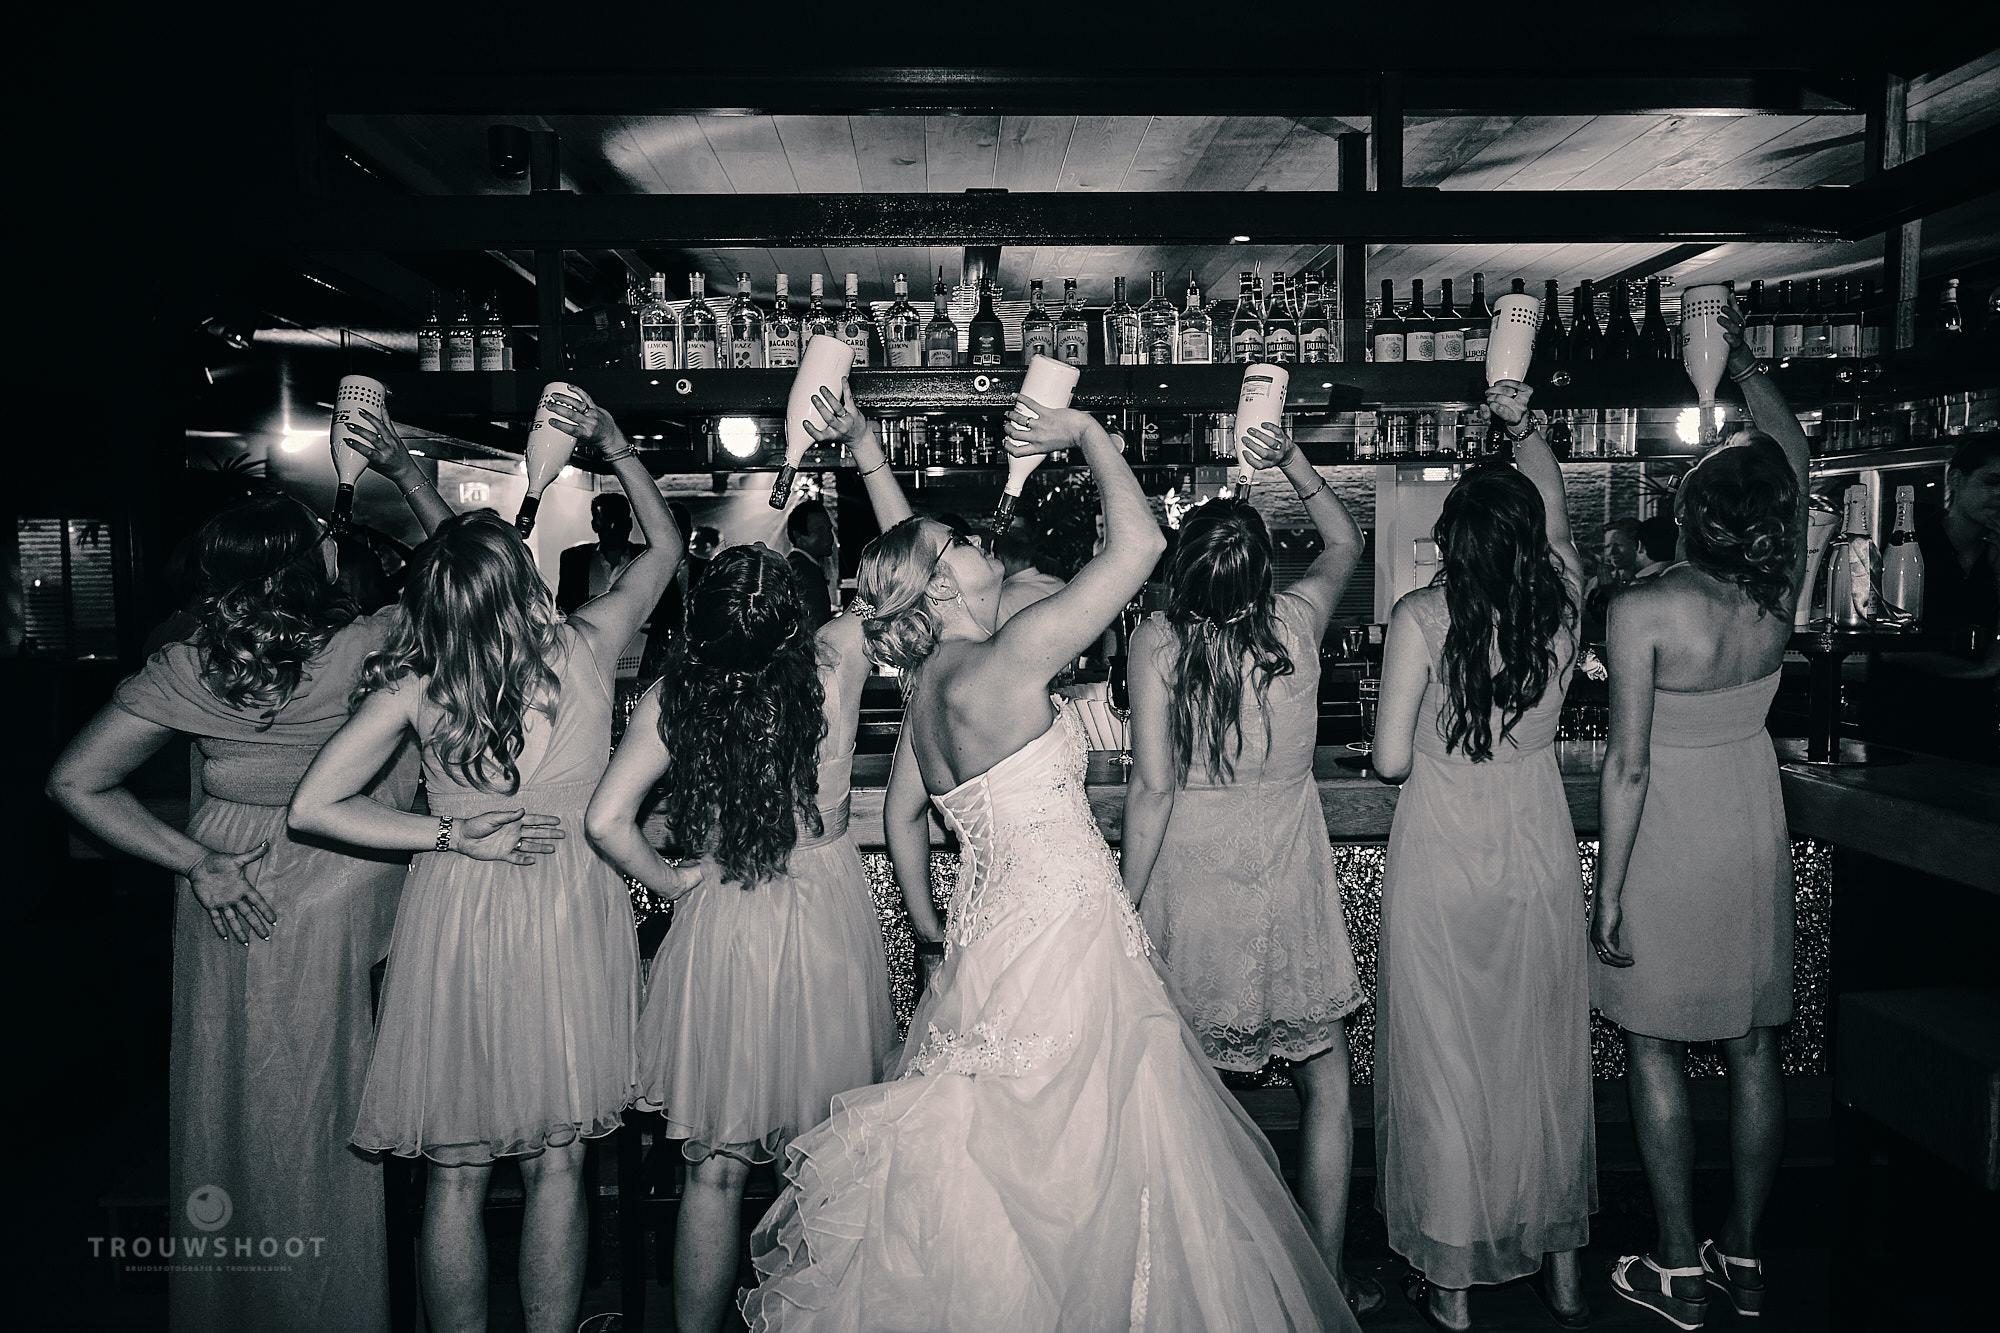 trouwshoot_bruidsfotografie_trouwfoto_296.jpg